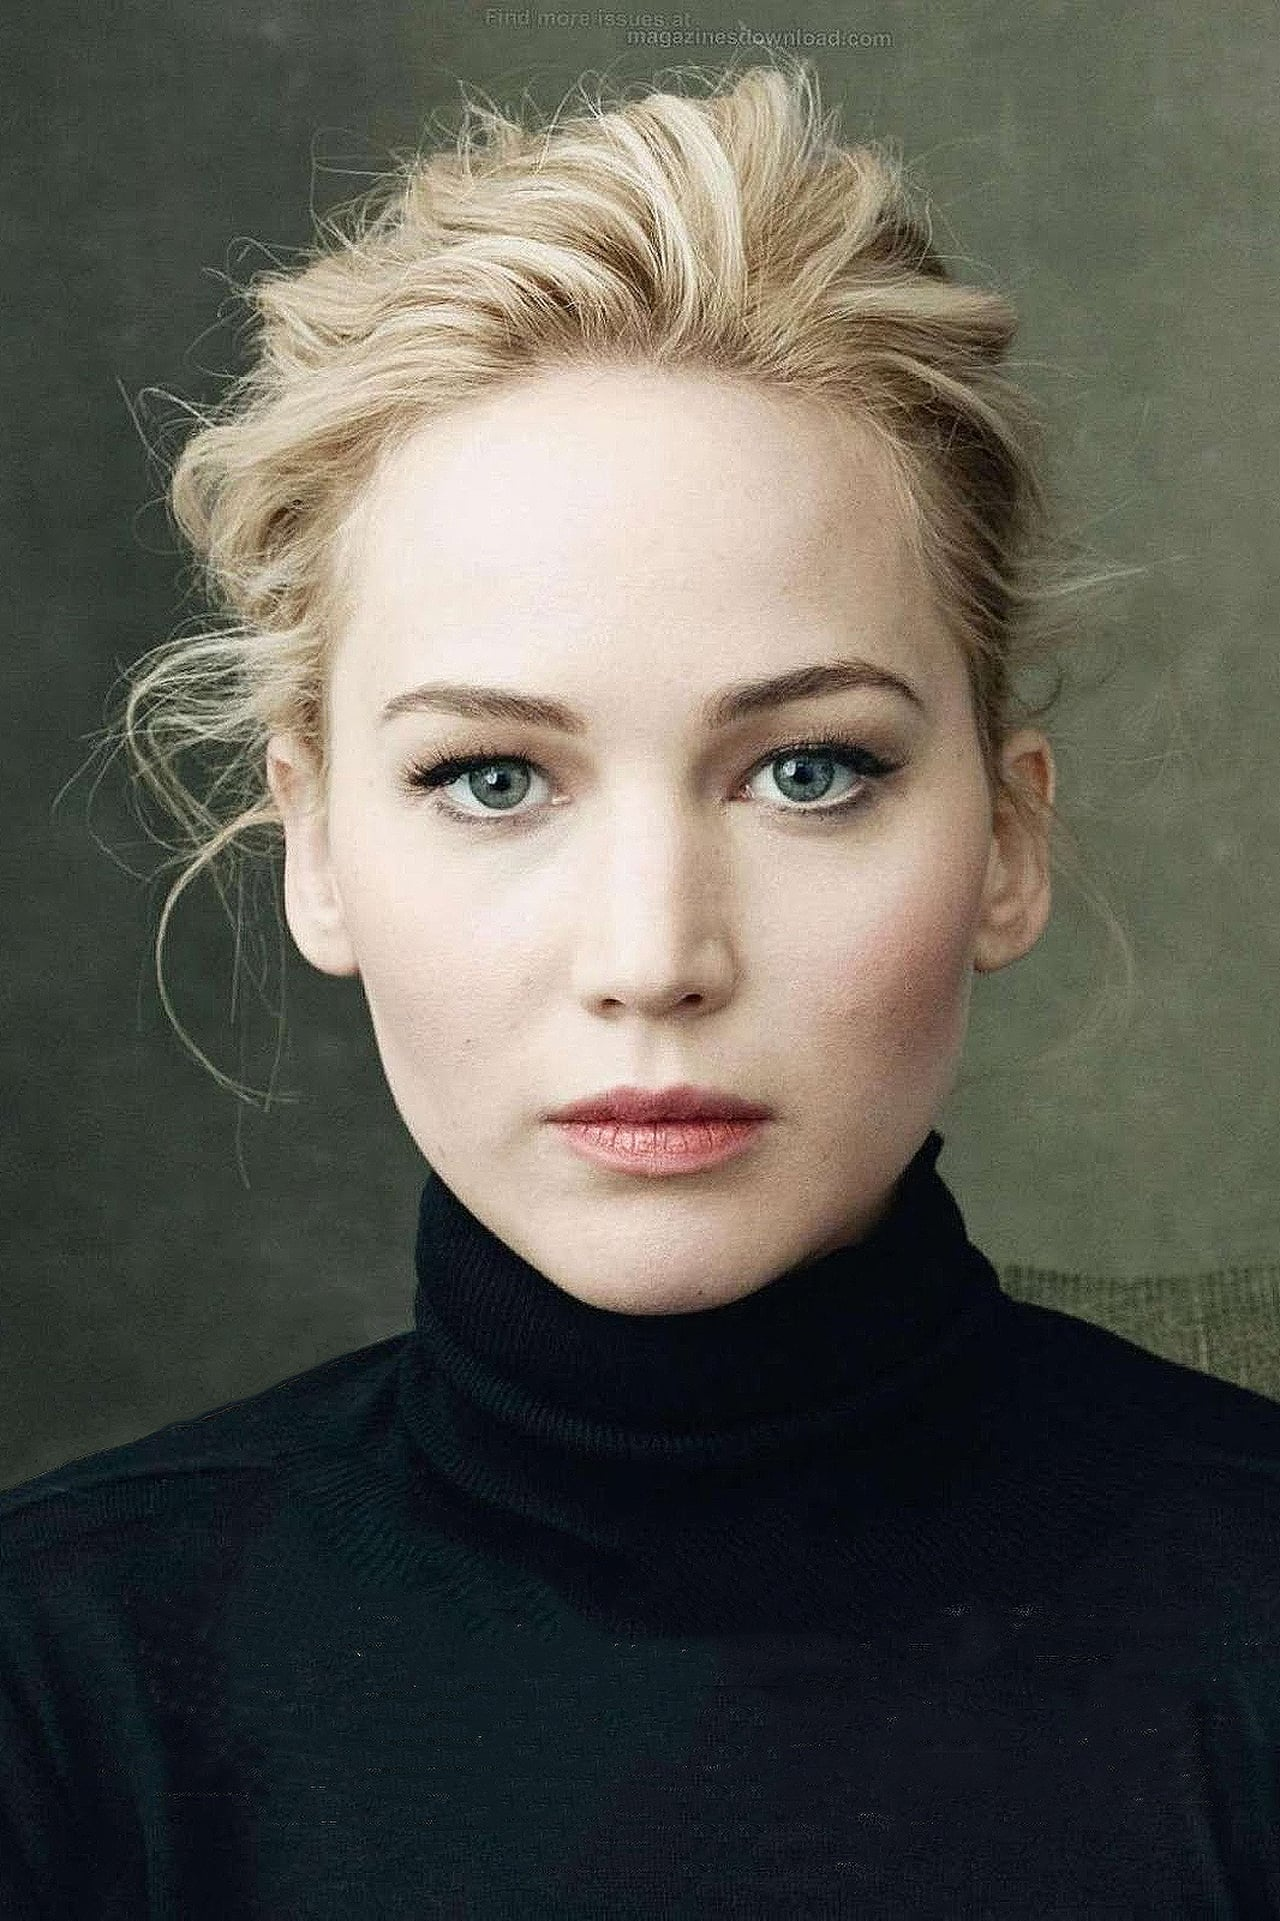 Jennifer Lawrence isRaven Darkholme / Mystique